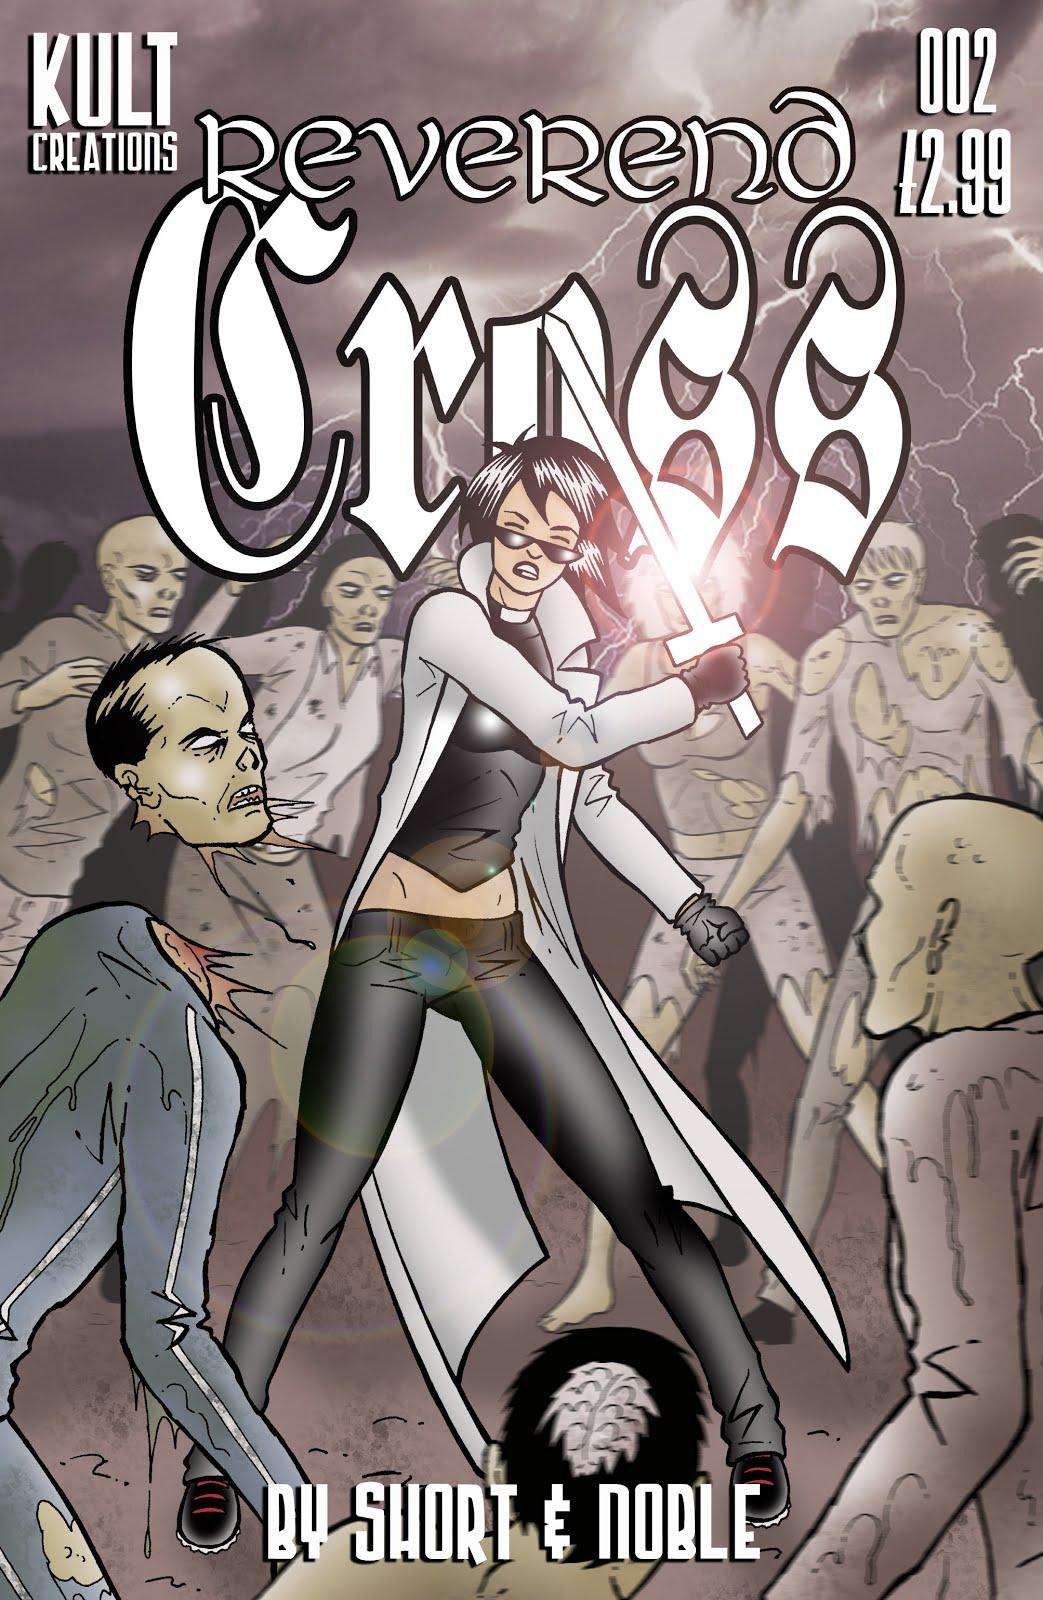 Buy REVEREND CROSS issue 002 BELOW!